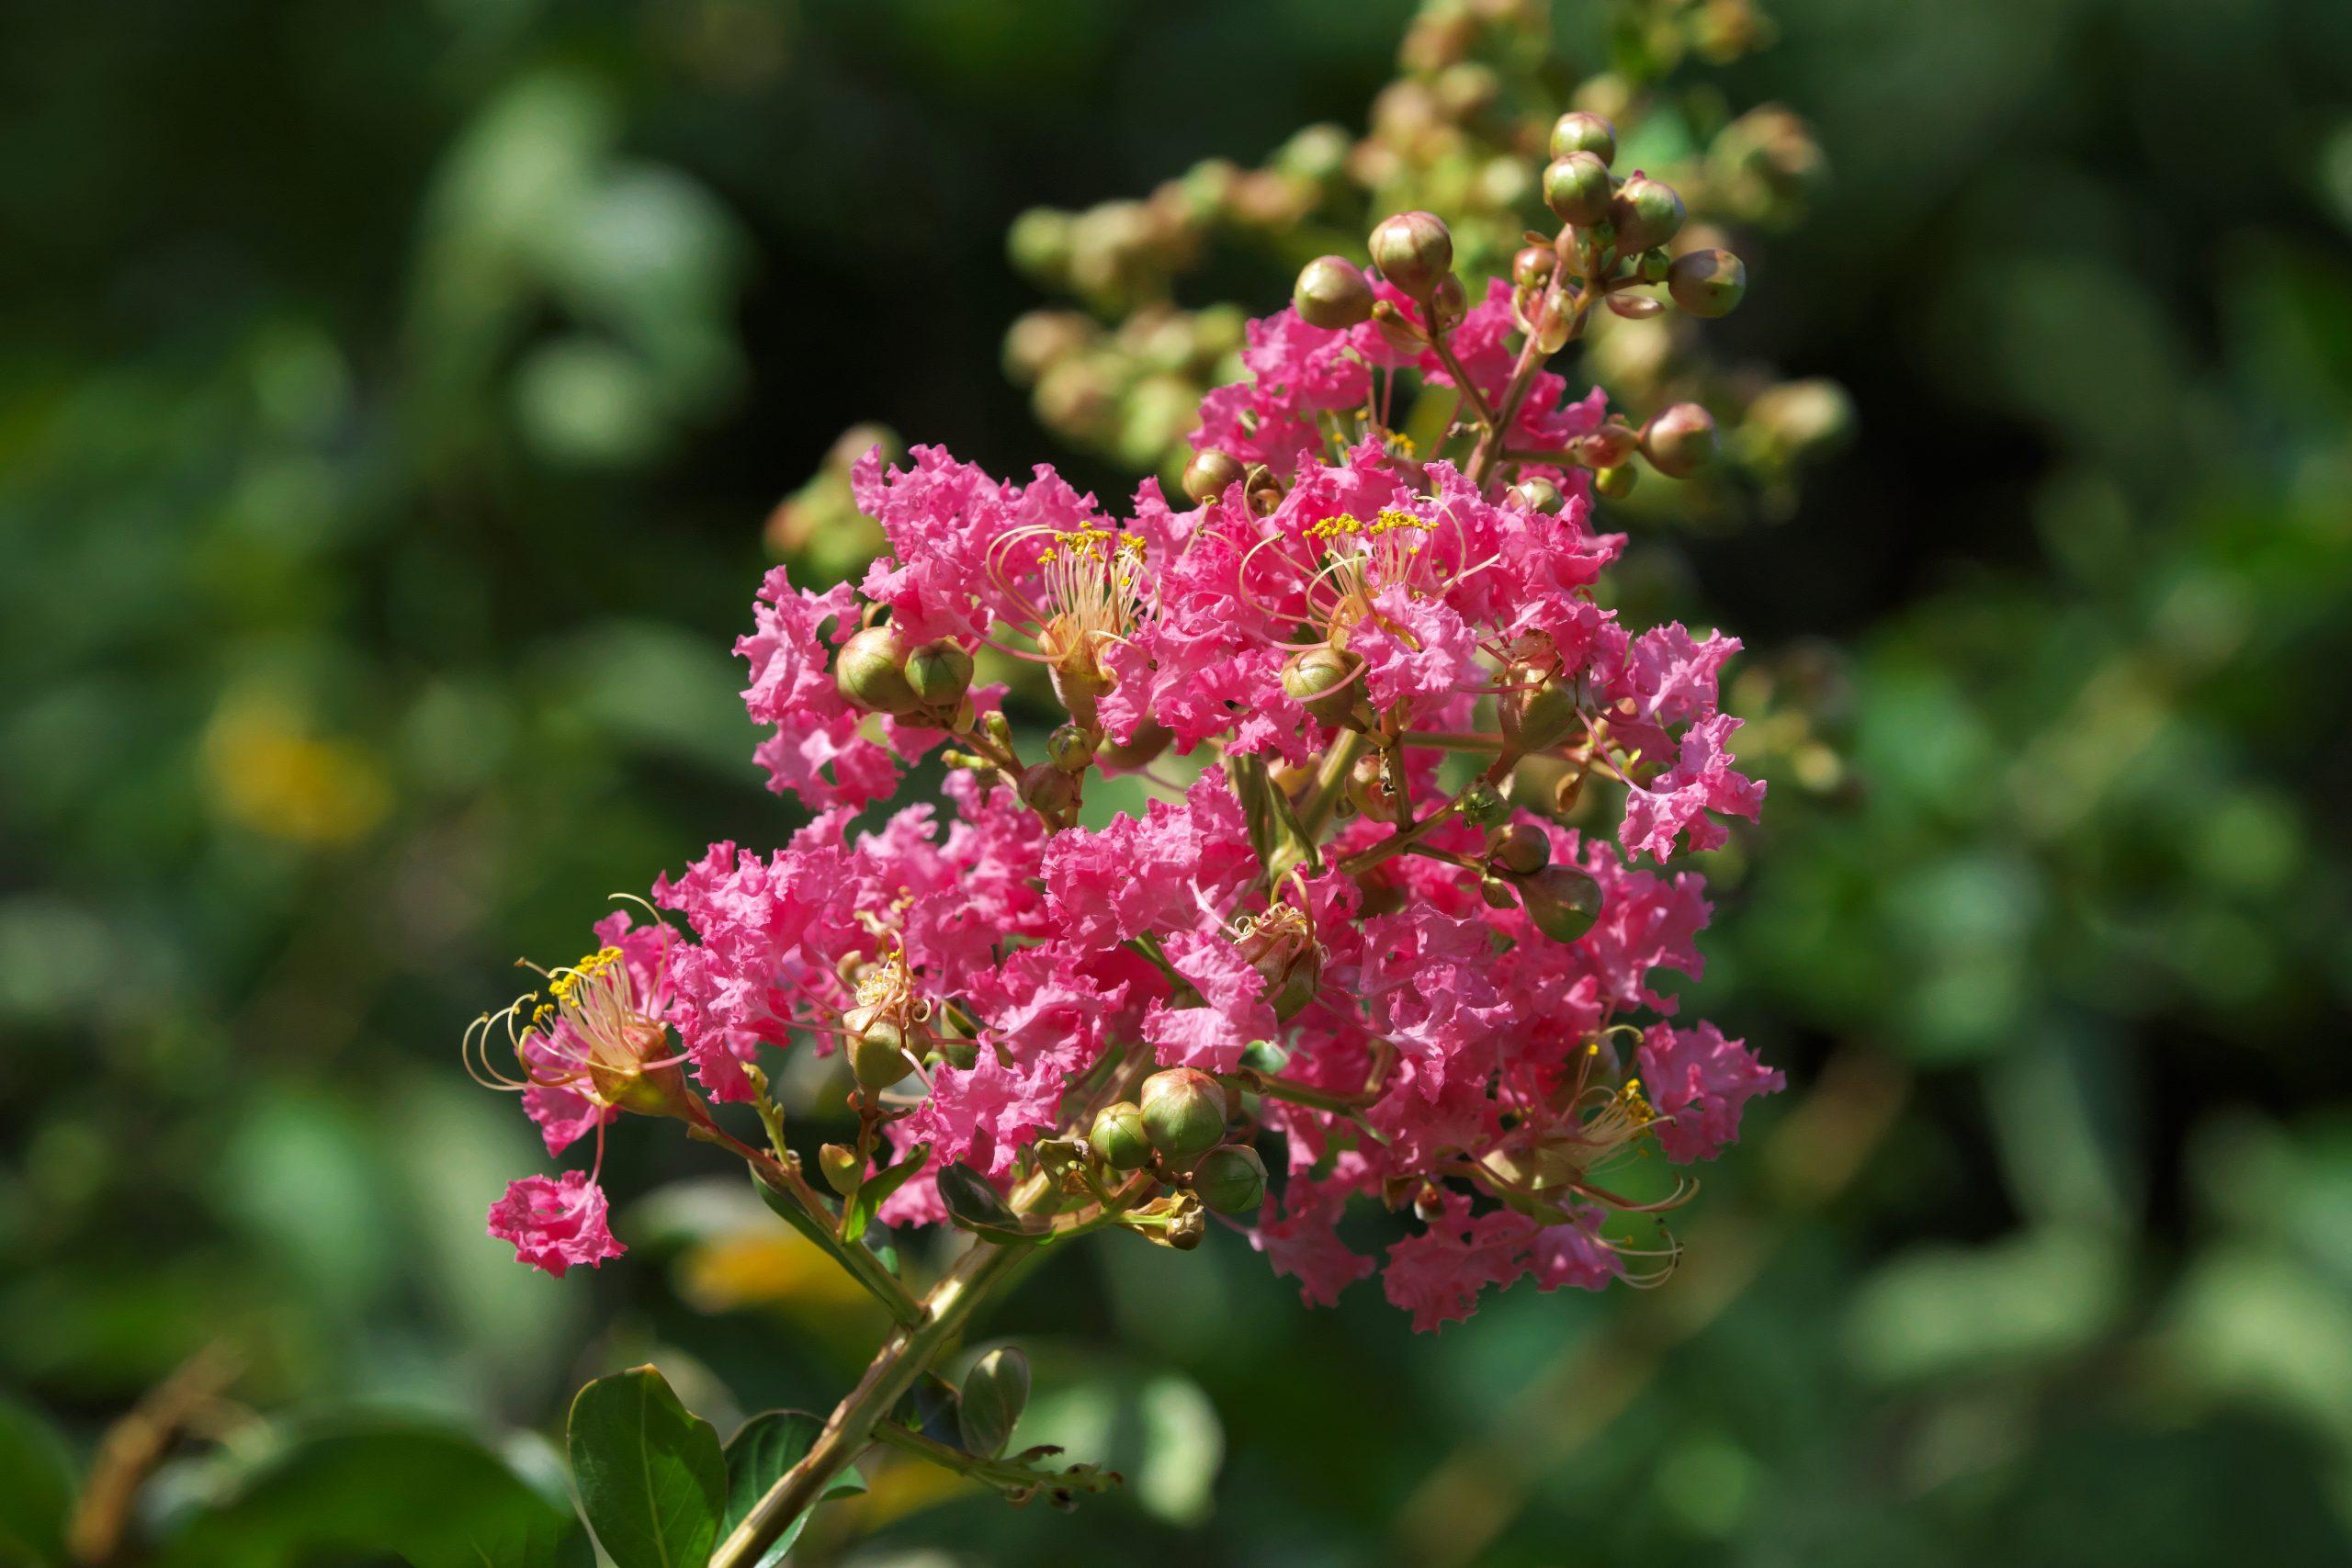 【SONY】この季節に咲く花(32)